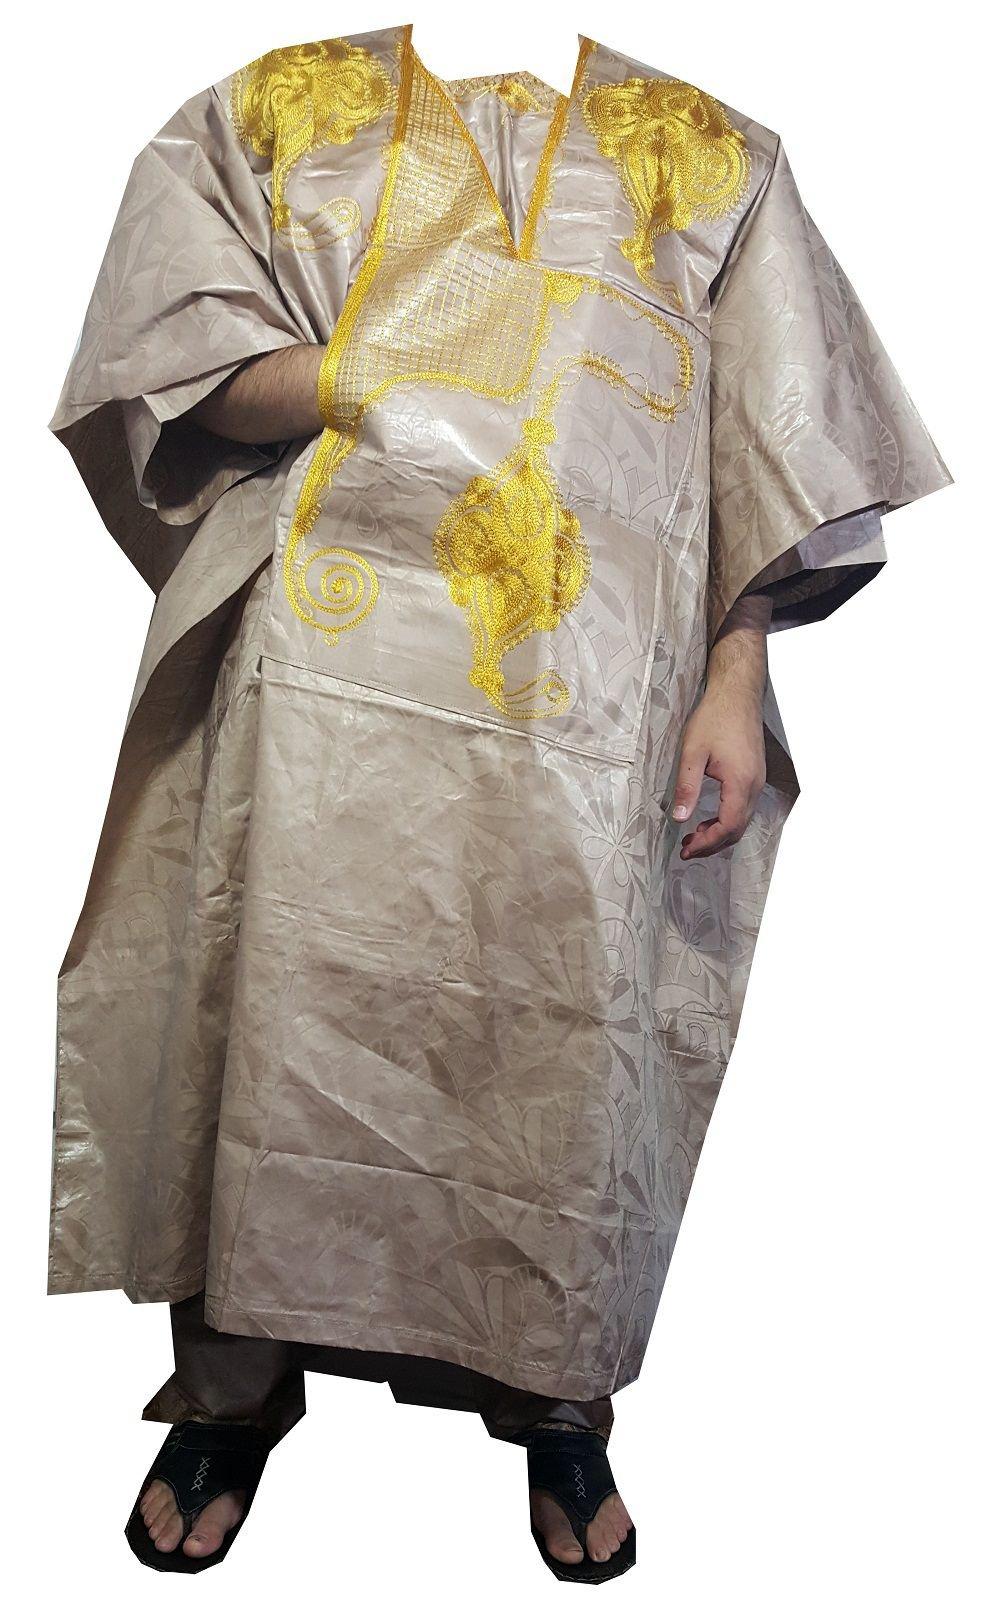 DecoraApparel African Grand bou bou Bubu pant set Men's Dashiki 4 Piece Cotton Suit Solid Colors by Decoraapparel (Image #1)